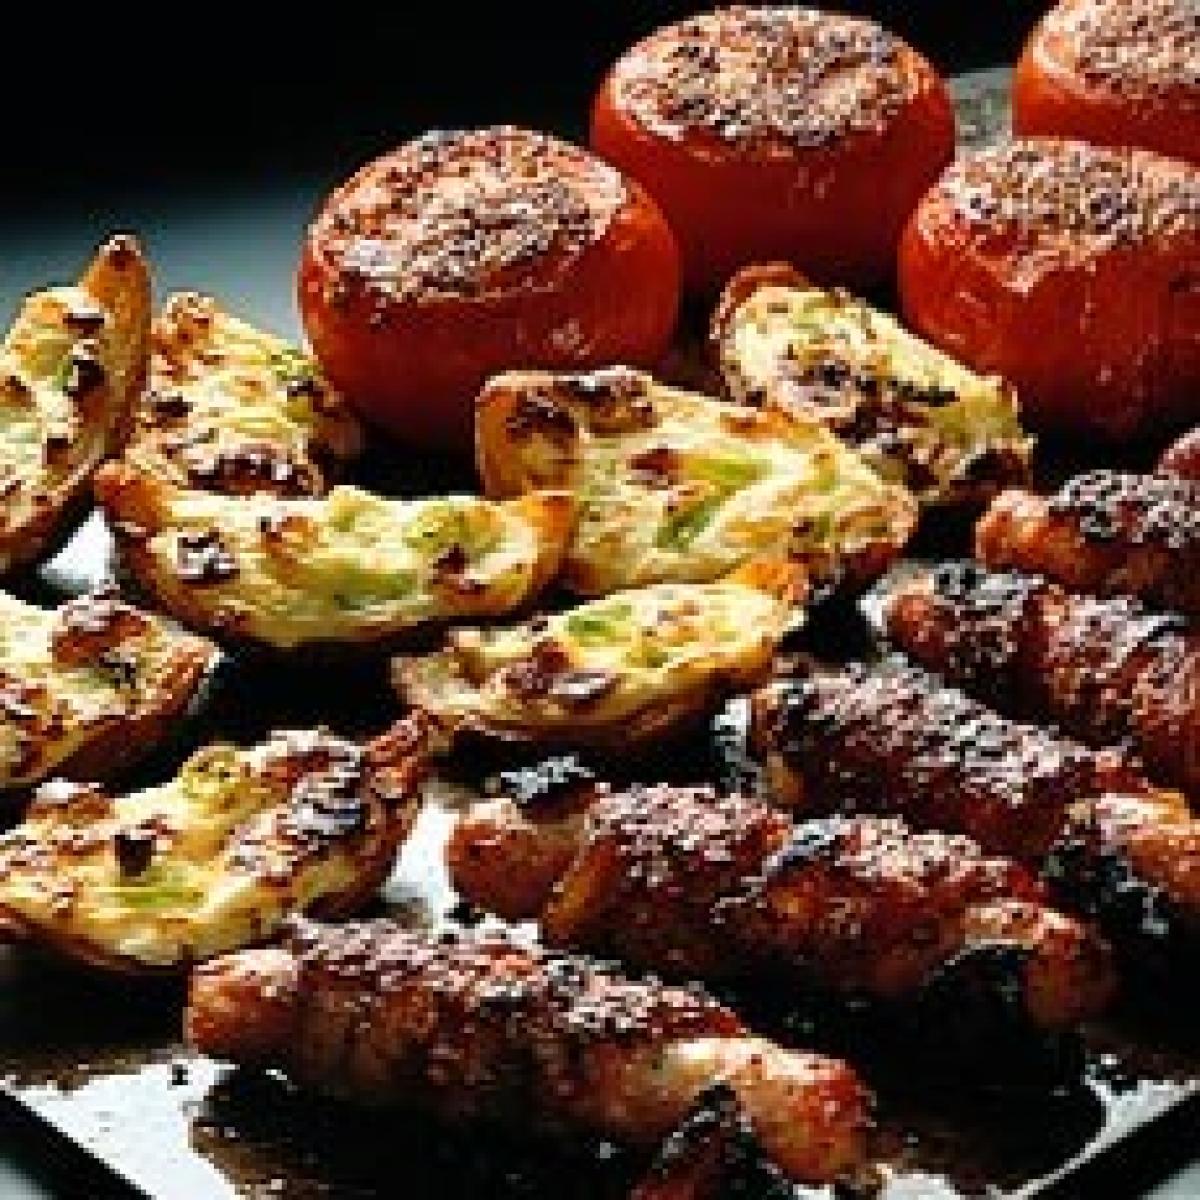 Old image sainsburys mag glazed bacon wrapped pork sausages with crispy cheese potato skins